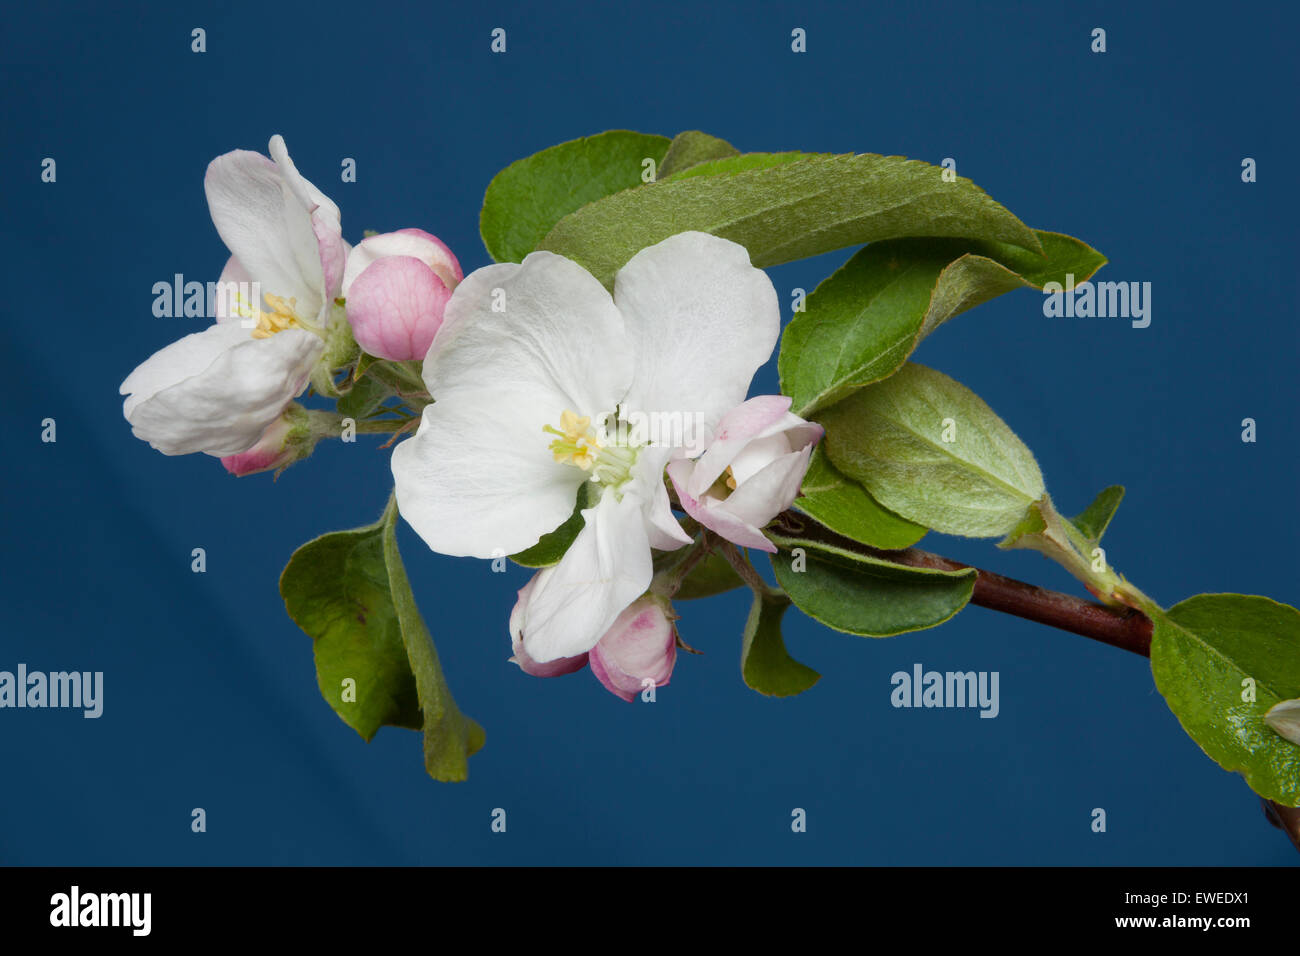 Apple blossoms in Ontario;Canada fruit farm - Stock Image